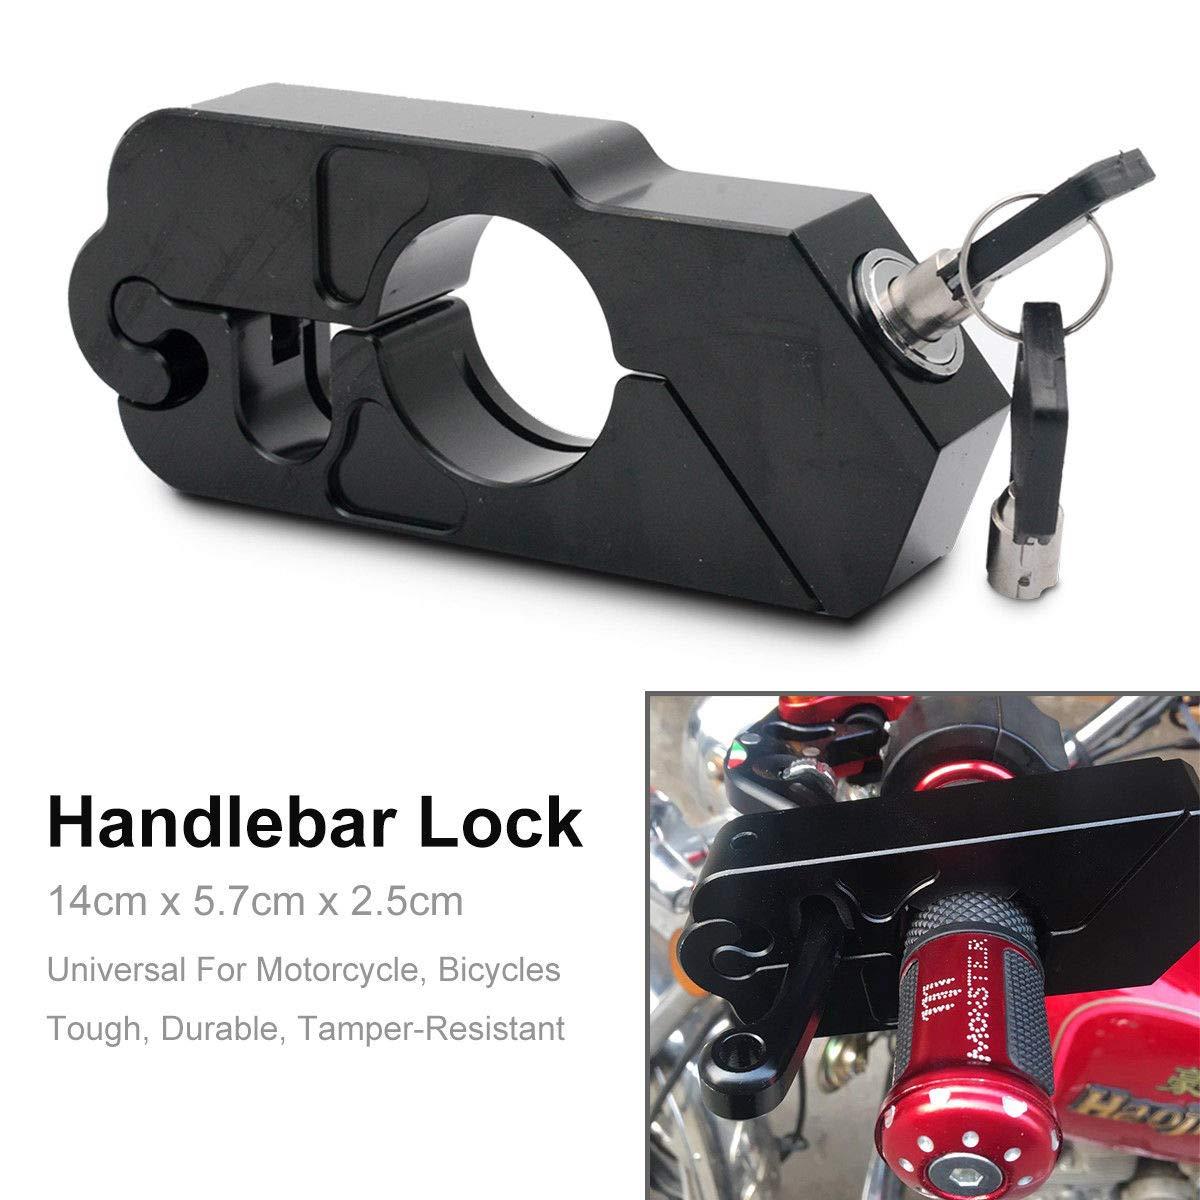 Black MASO Motorbike Handlebar Lock Aluminum Alloy Anti-Theft Brake Level Lock for Motorbike Motorcycle Bike Scooter Moped ATV